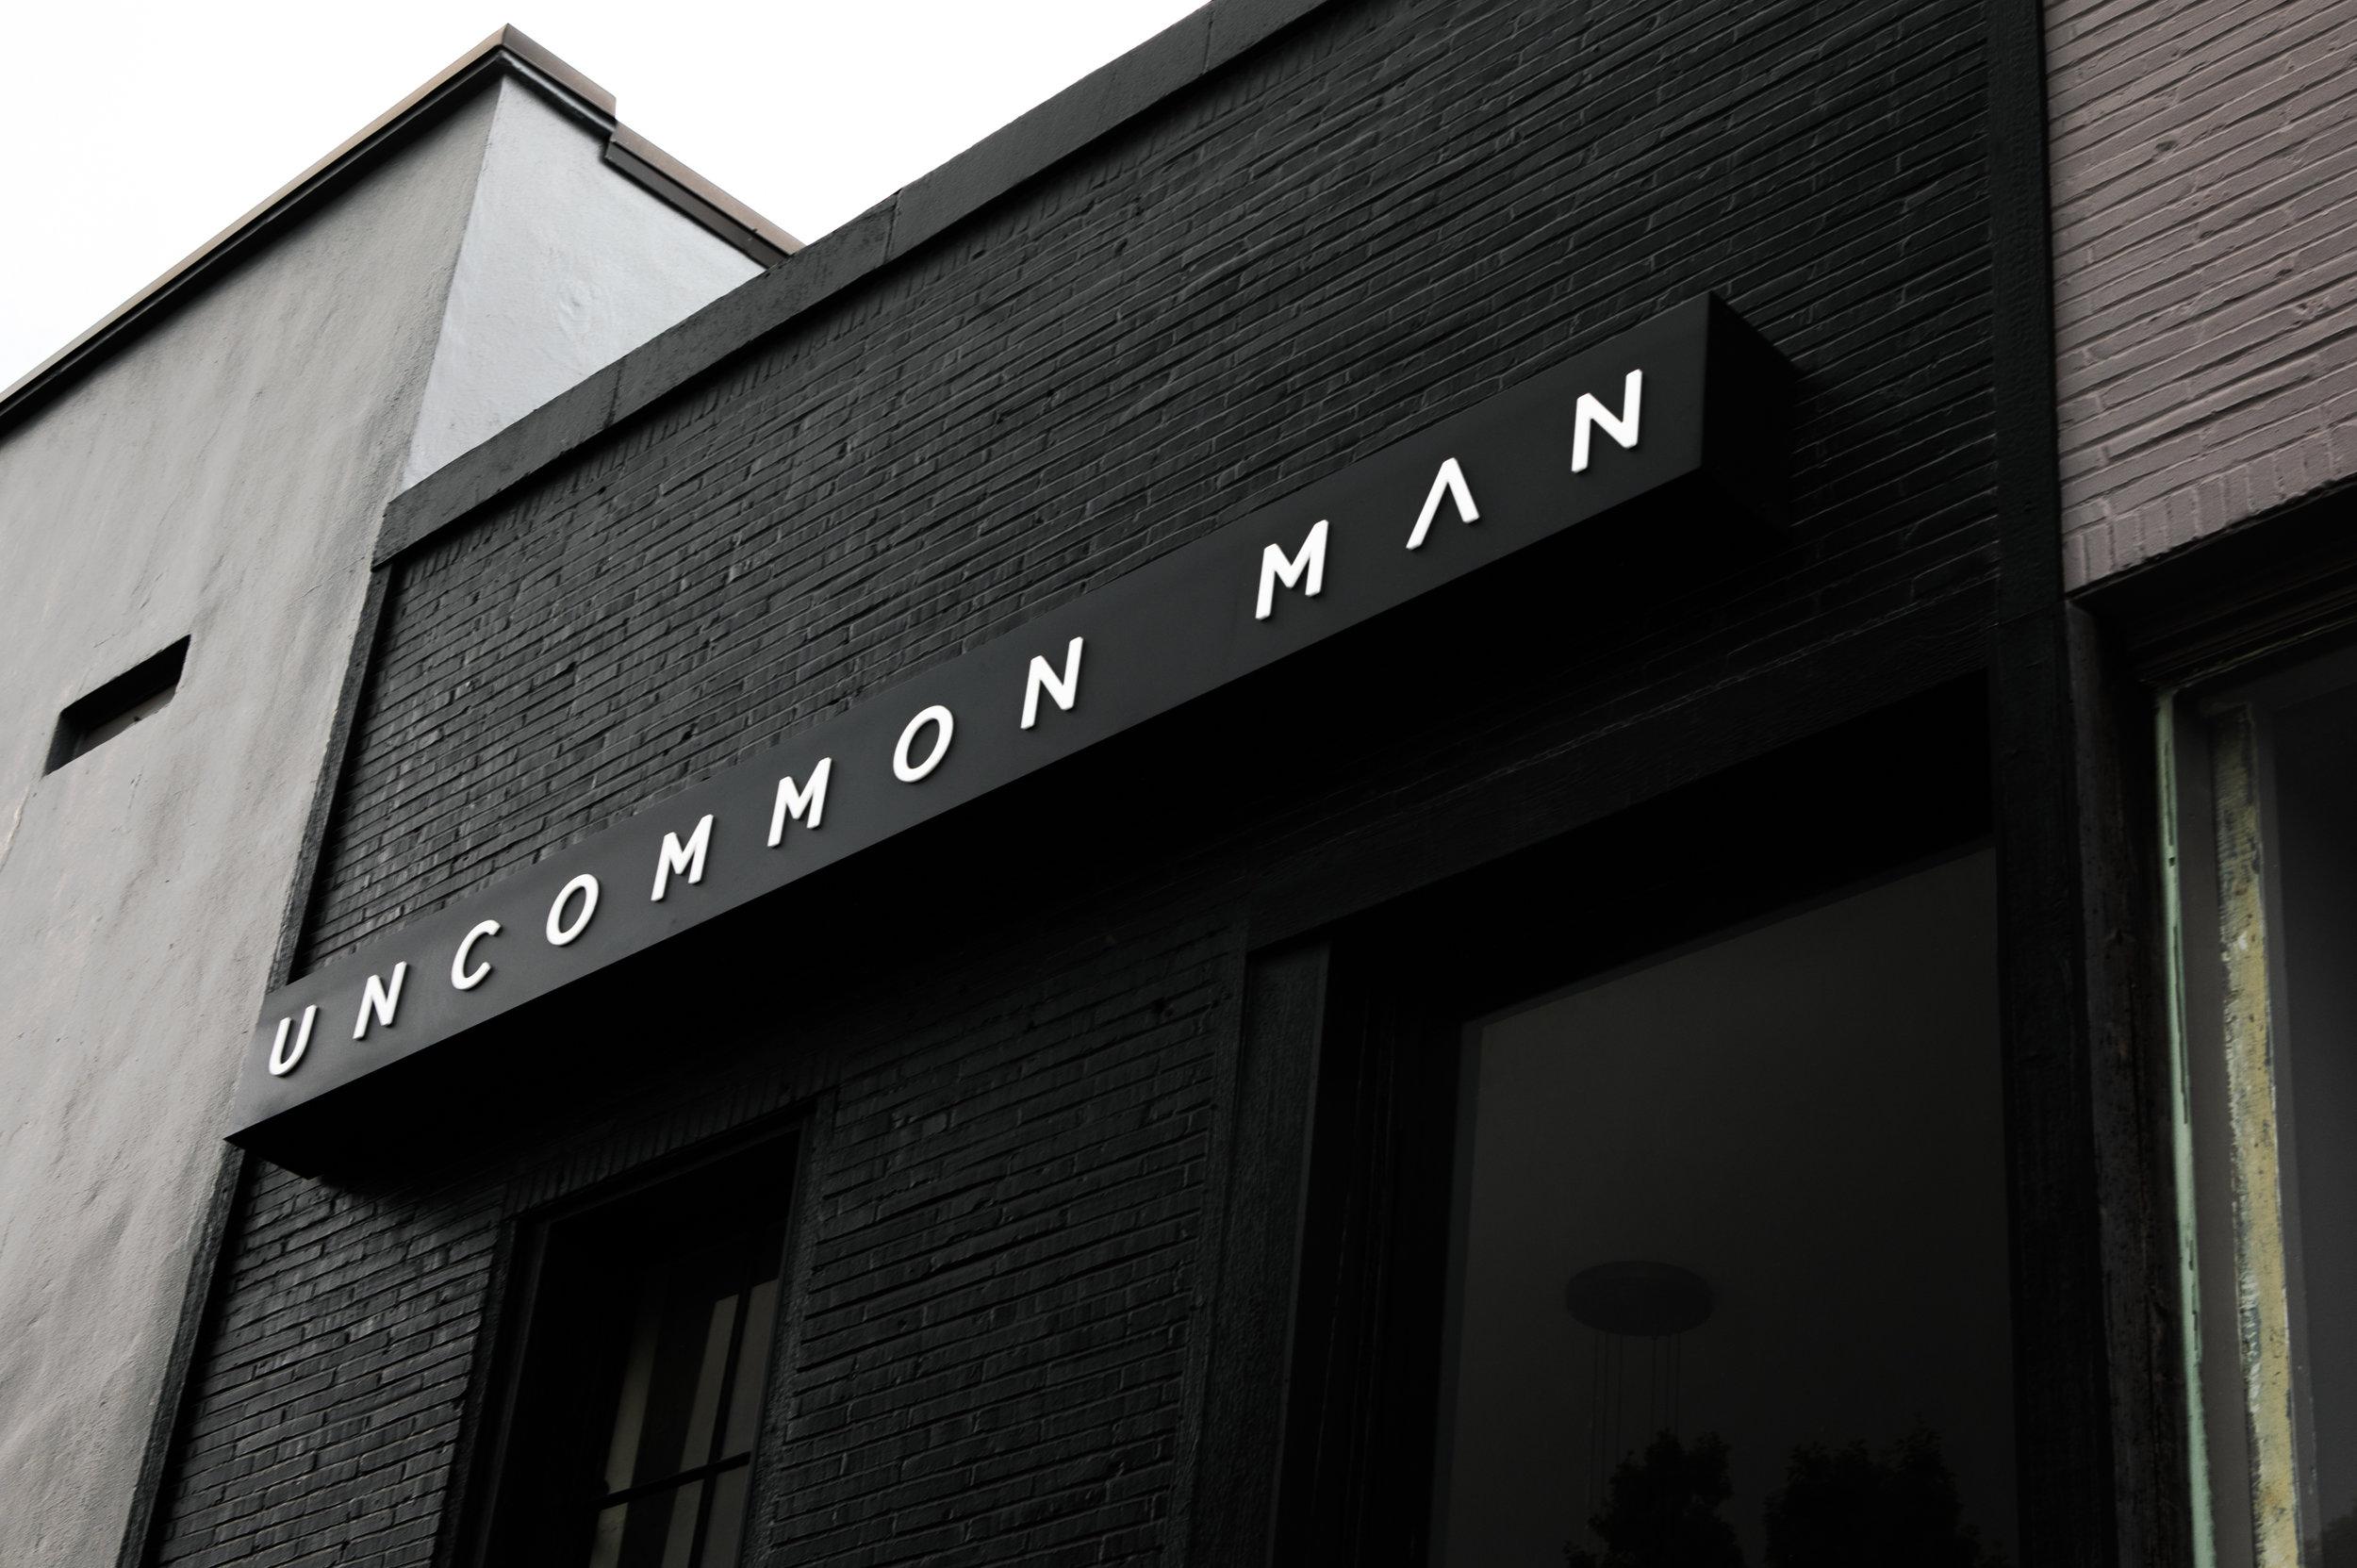 Uncommon_Man-6.jpg